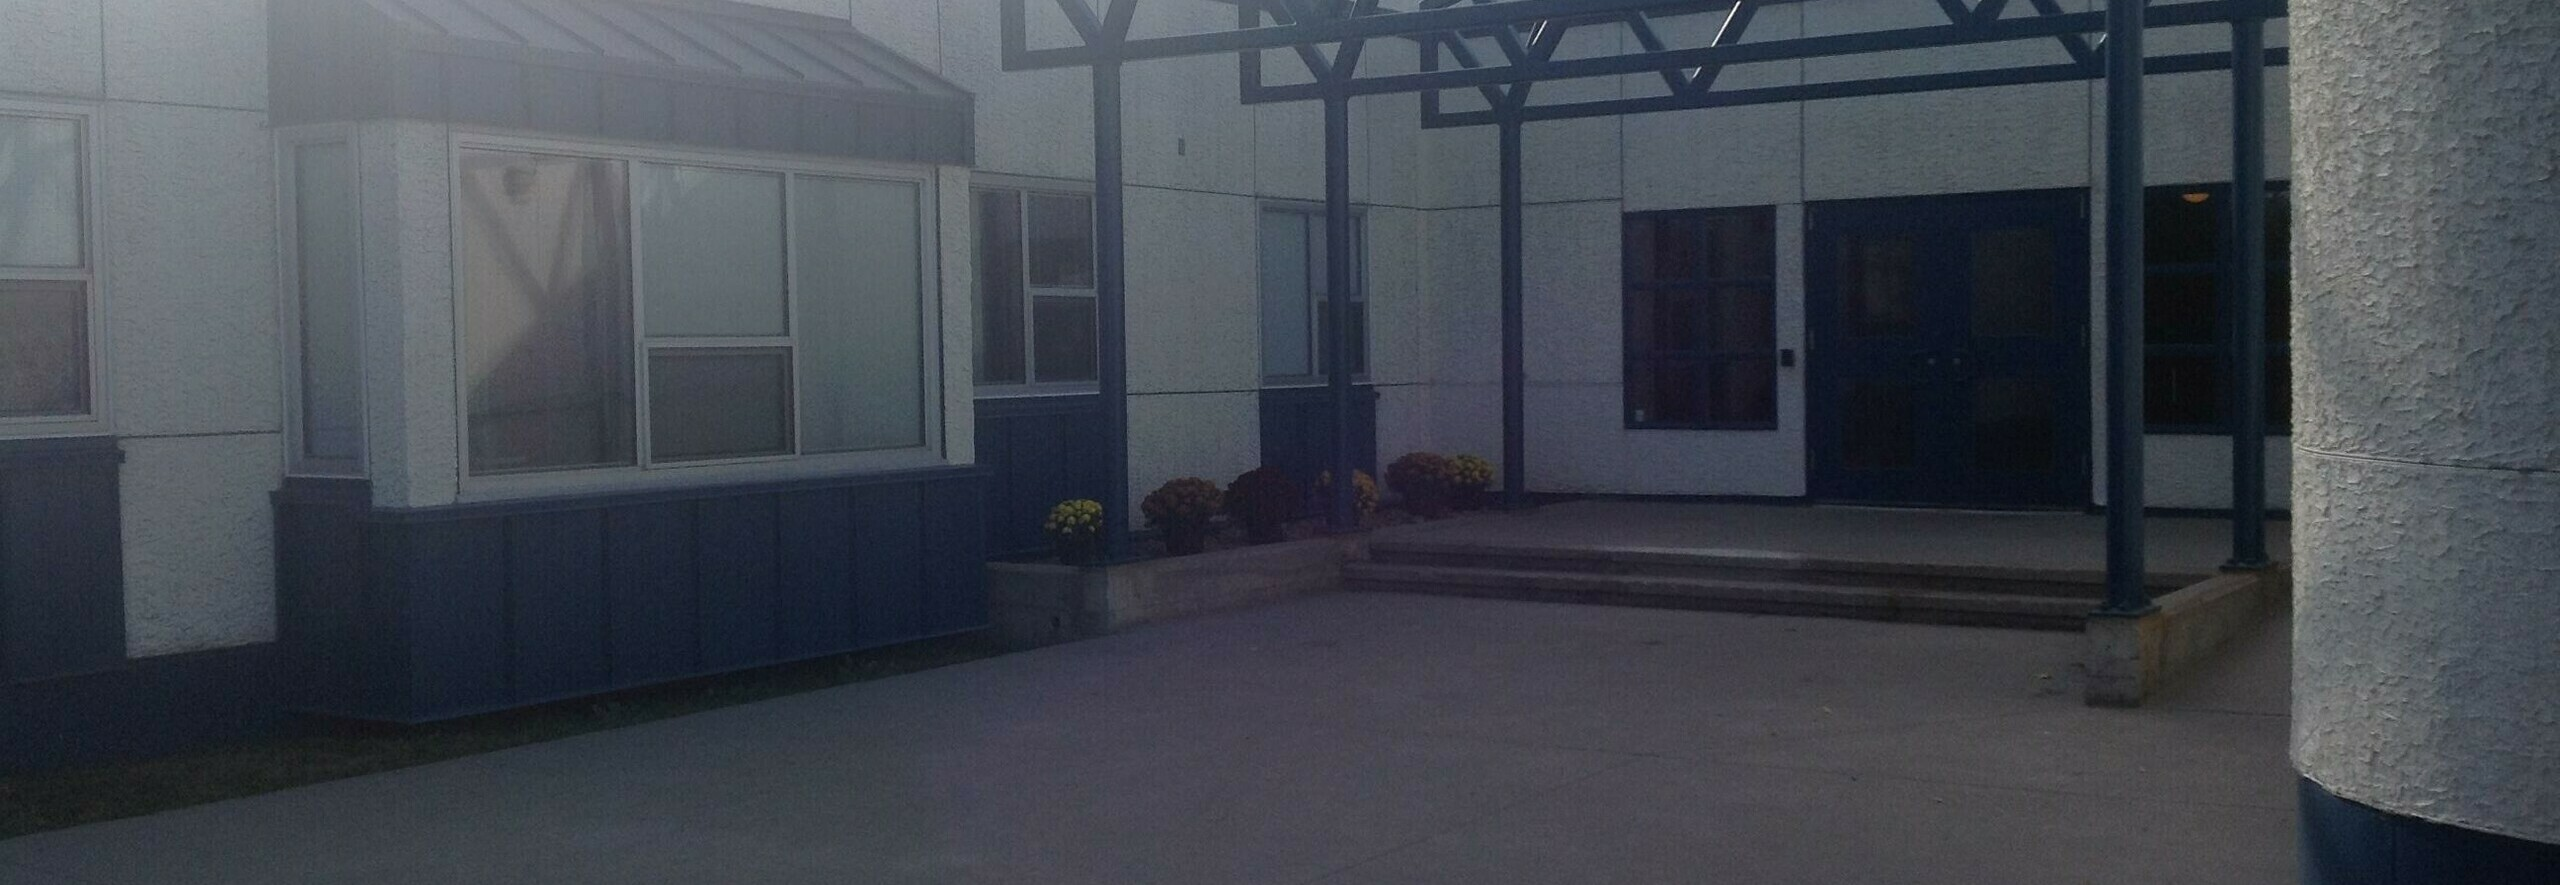 Whitecourt Central Elementary School Banner Photo